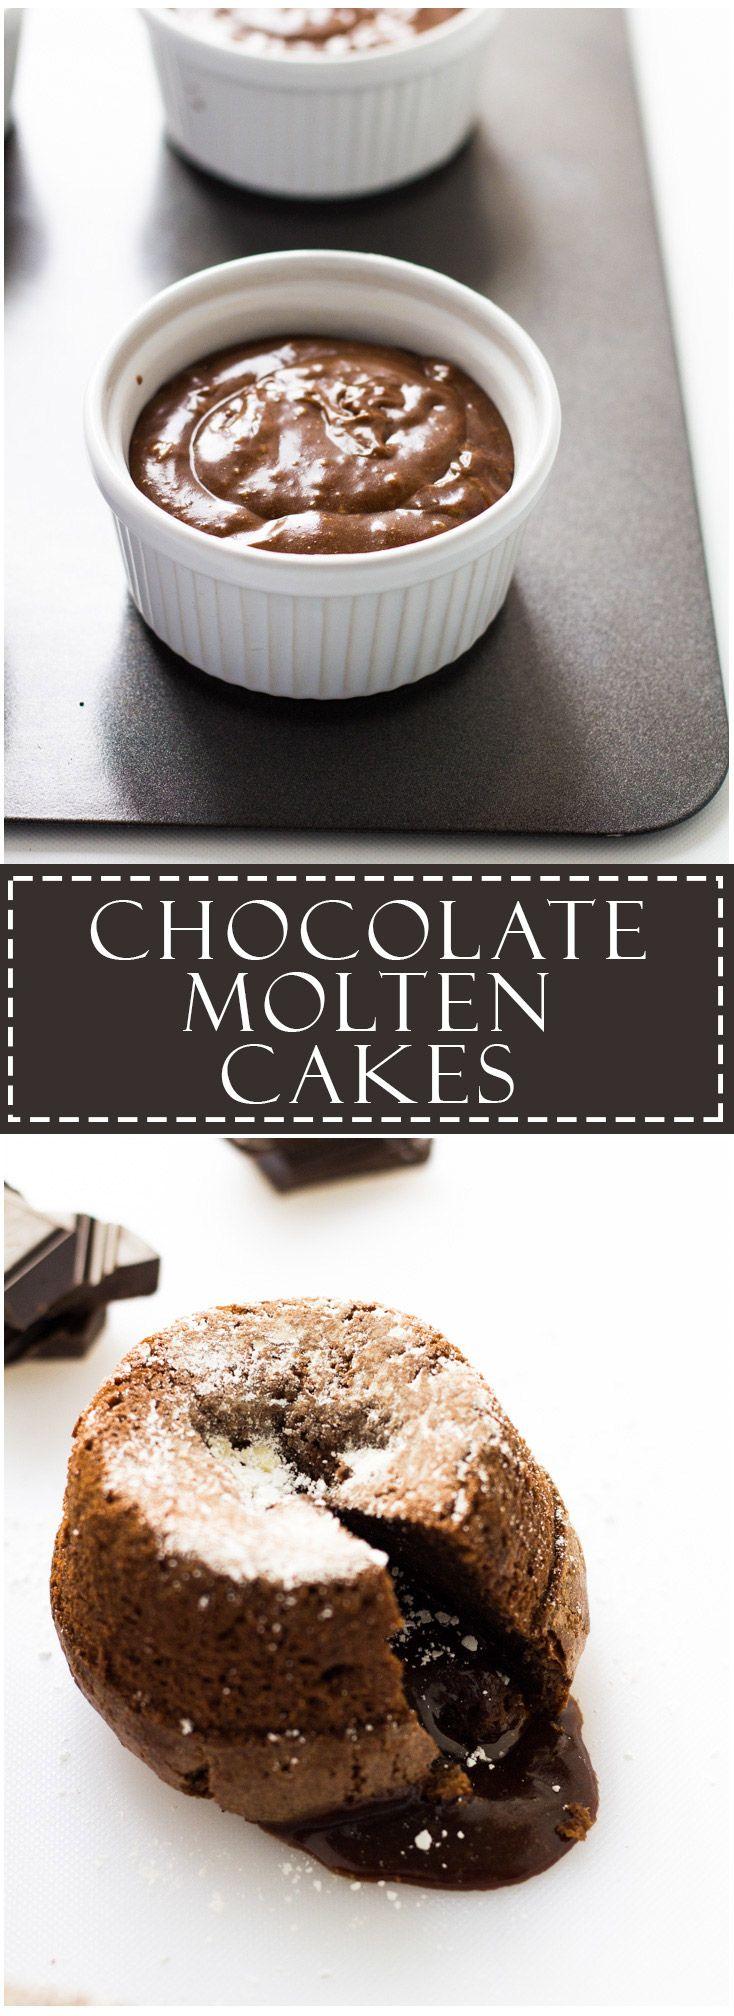 402609 best Dessert Recipes images on Pinterest | Dessert recipes ...